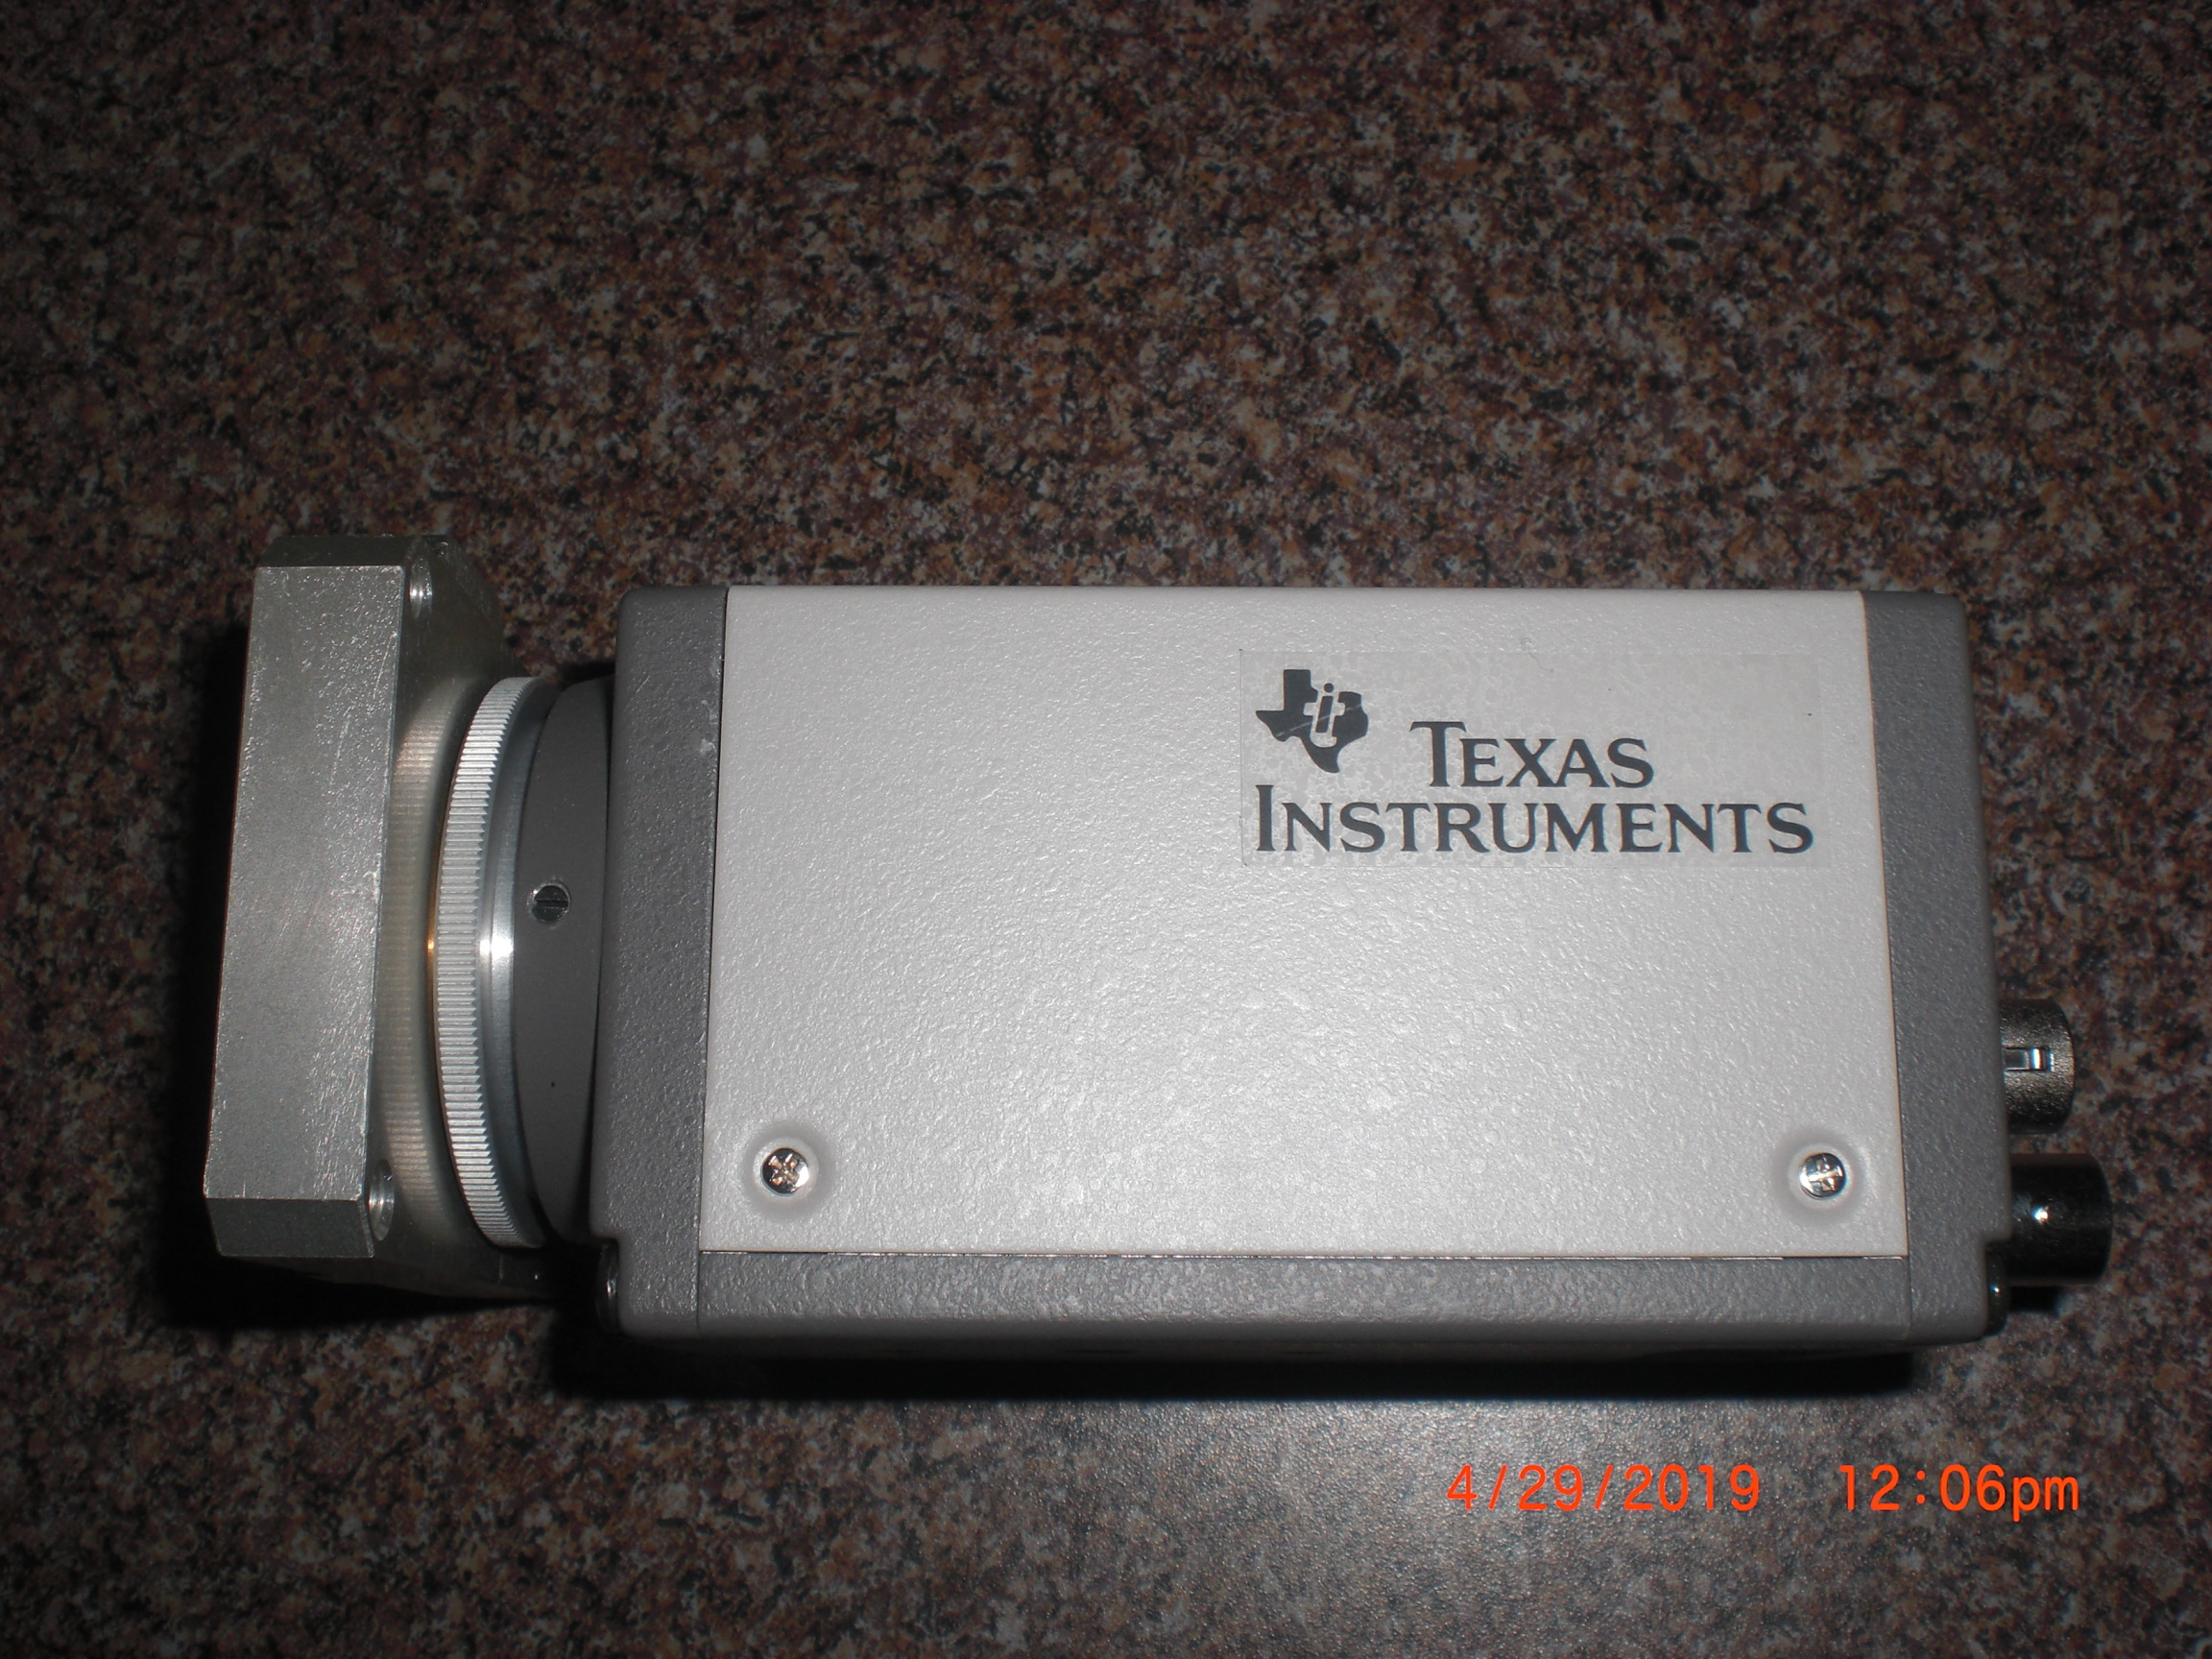 Camera TEXAS INSTRUMENTS 2546660-9130 MC-780PIA-U2  VRA Search Nikon